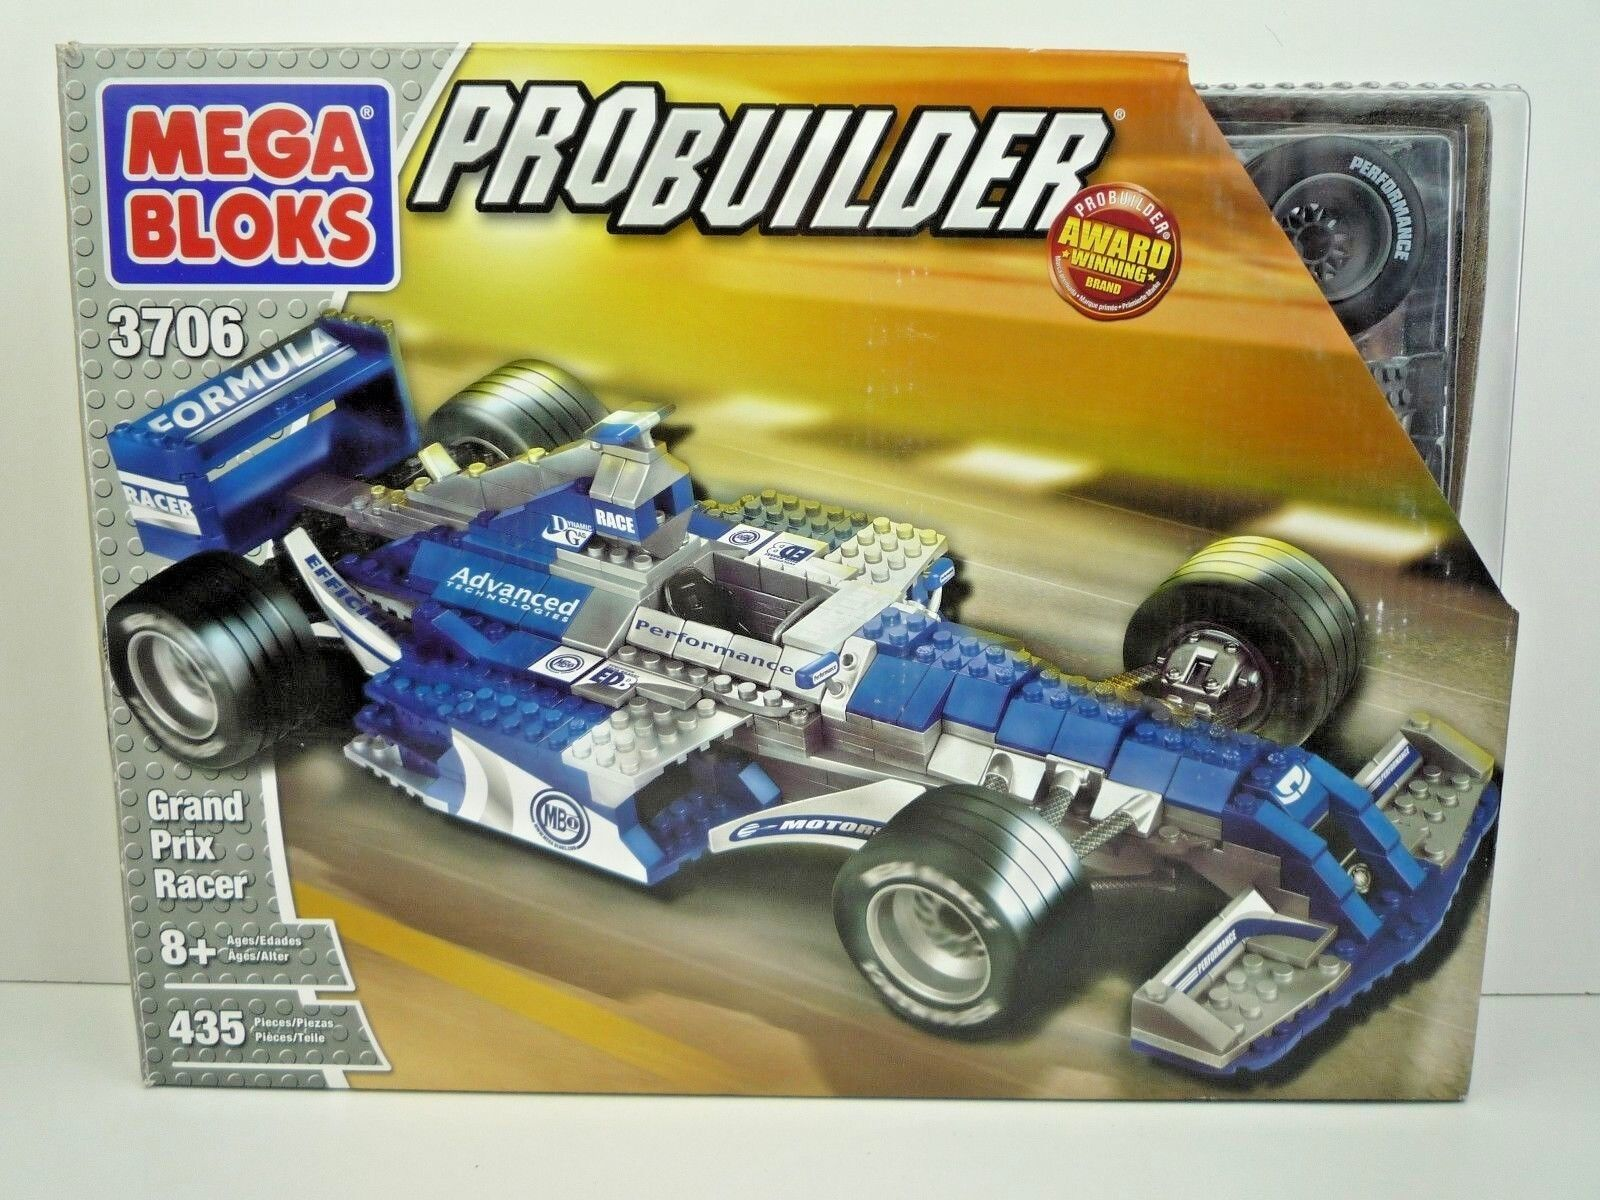 MEGA Bloks PRO BUILDER 3706 Grand Prix Racer 435 Pezzi SIGILLATO